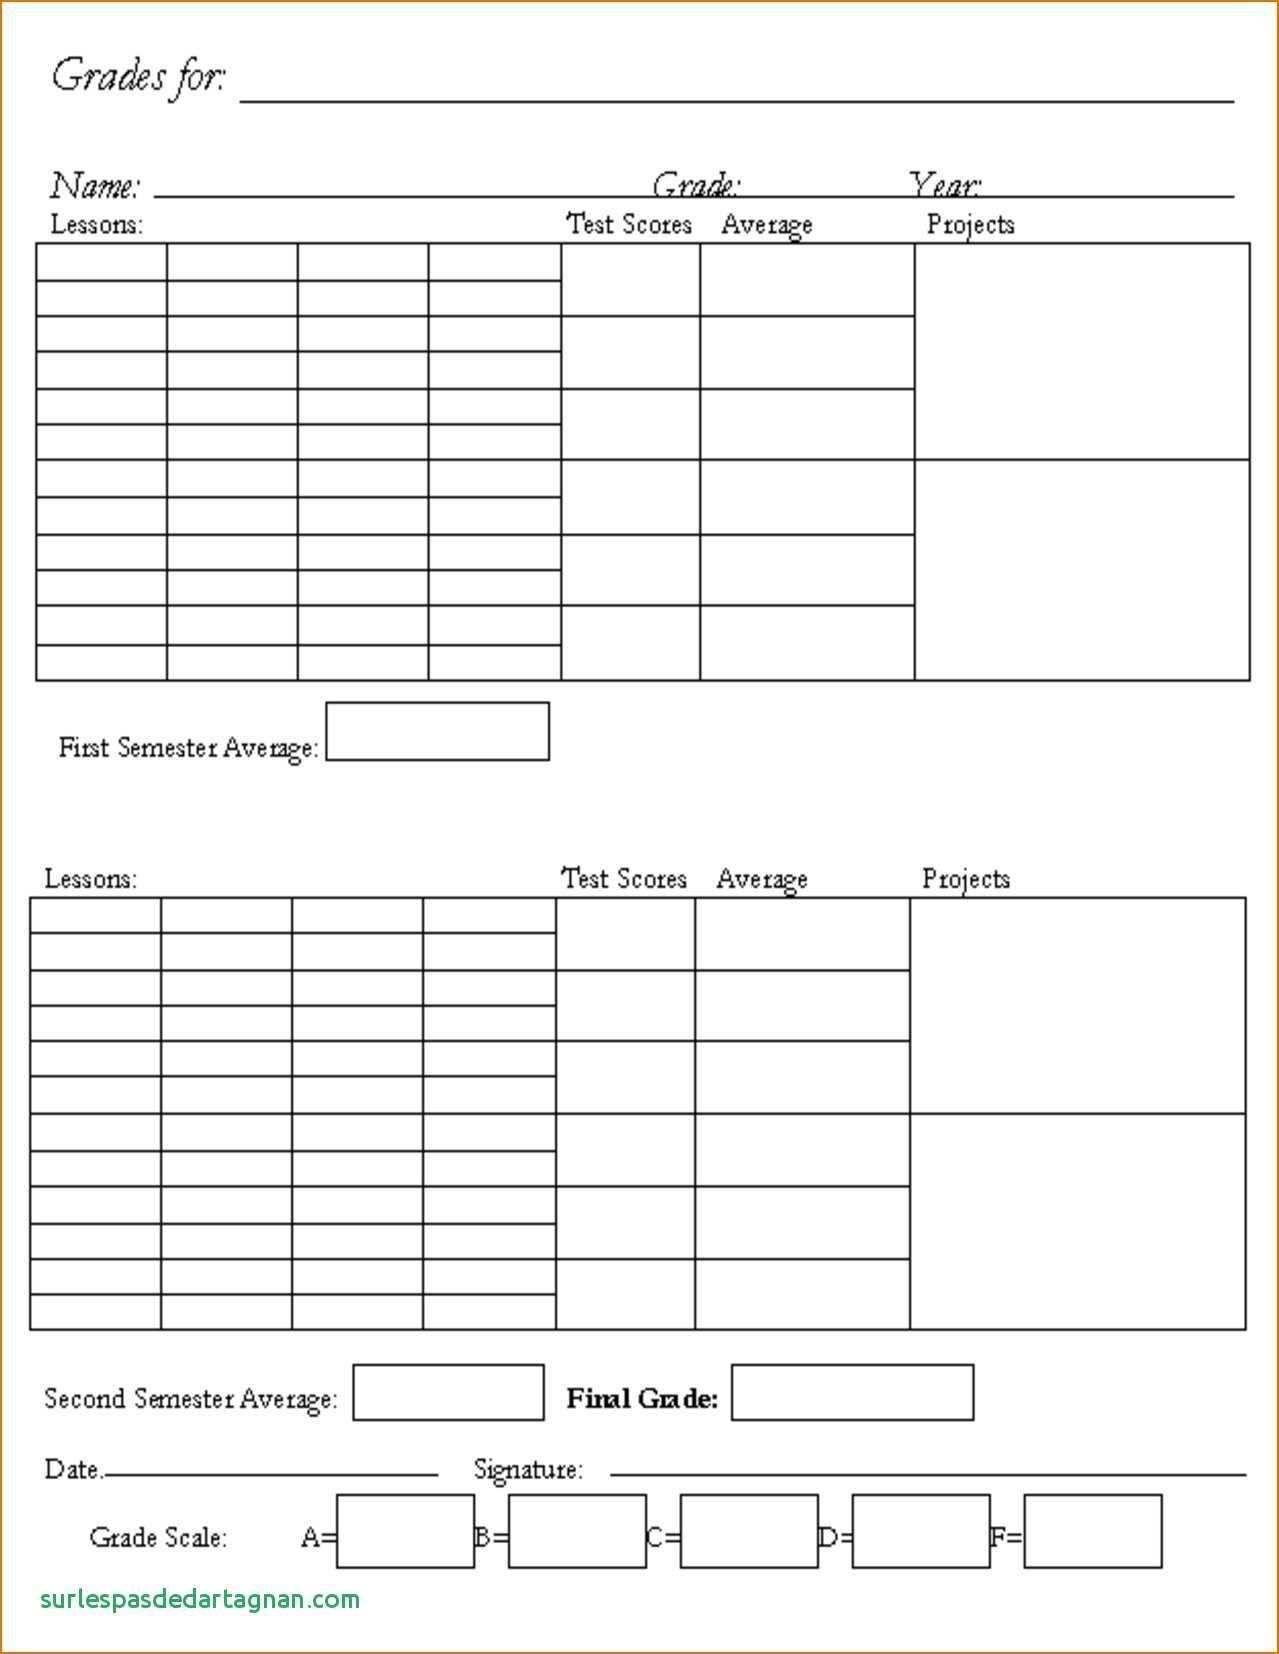 002 Unforgettable Homeschool Middle School Report Card Template Design  8th Grade TranscriptFull